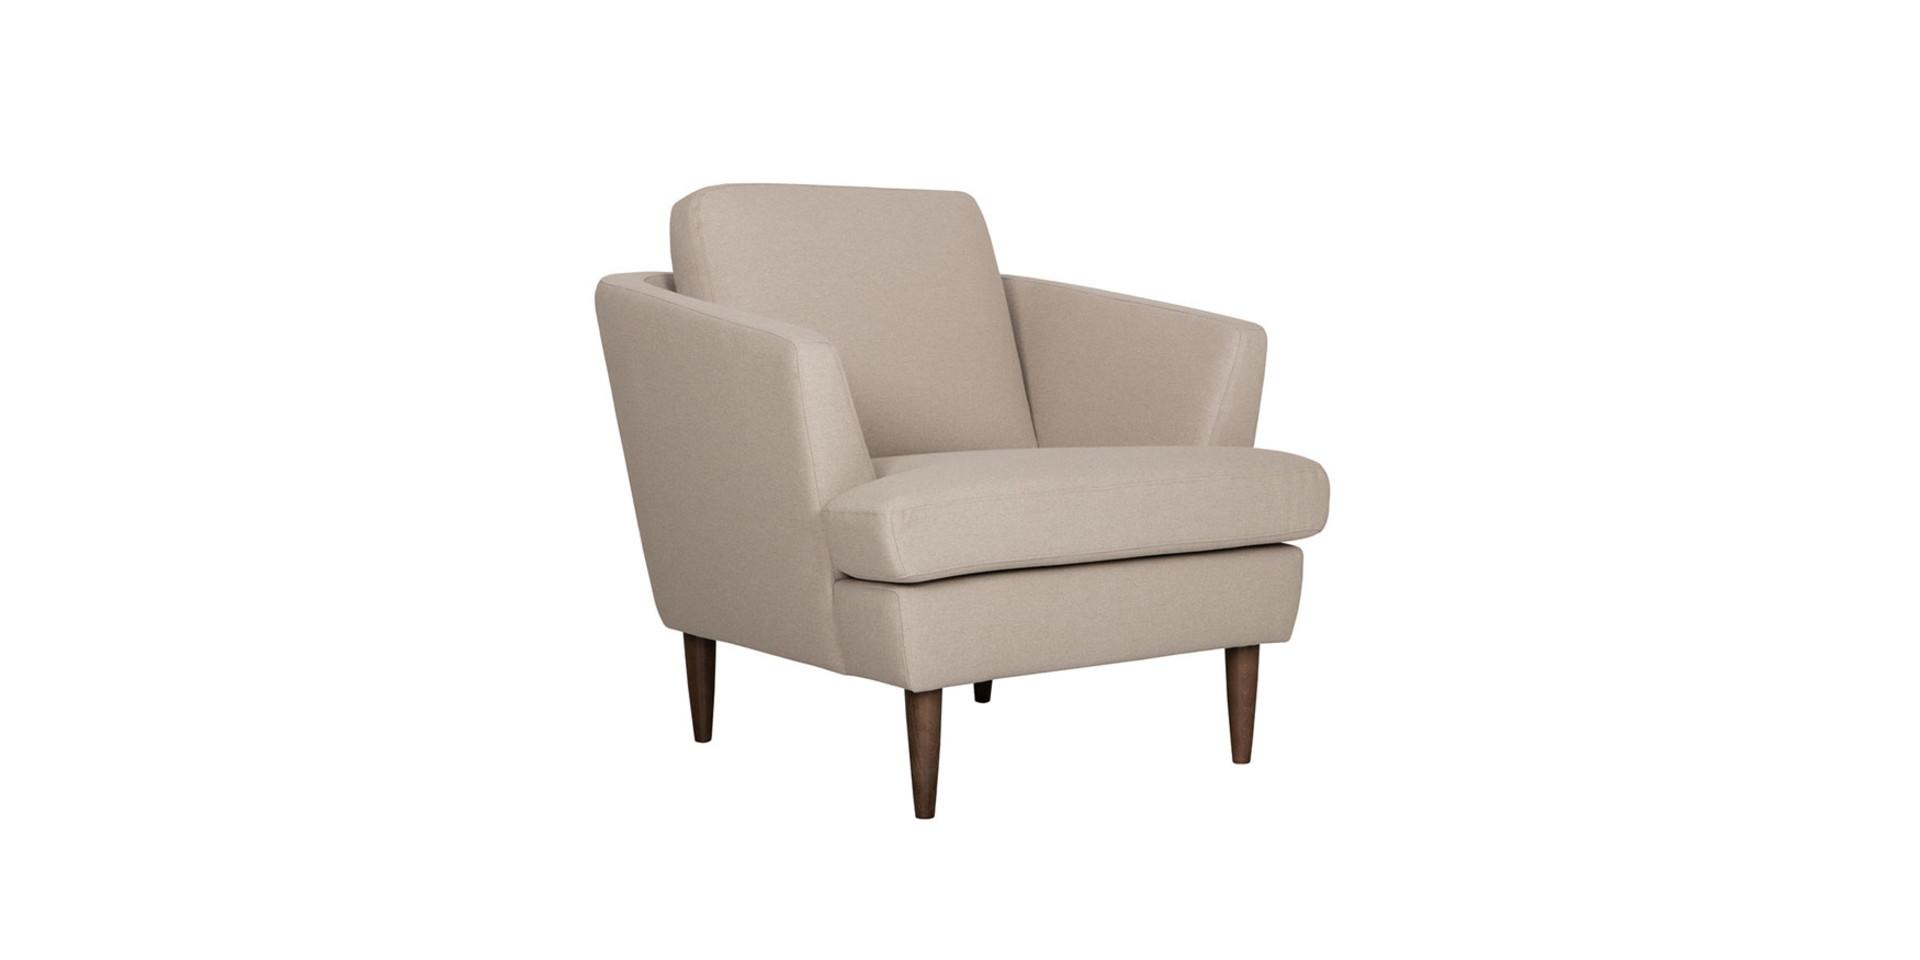 sits-timjan-fauteuil-armchair_luis4_beige_2